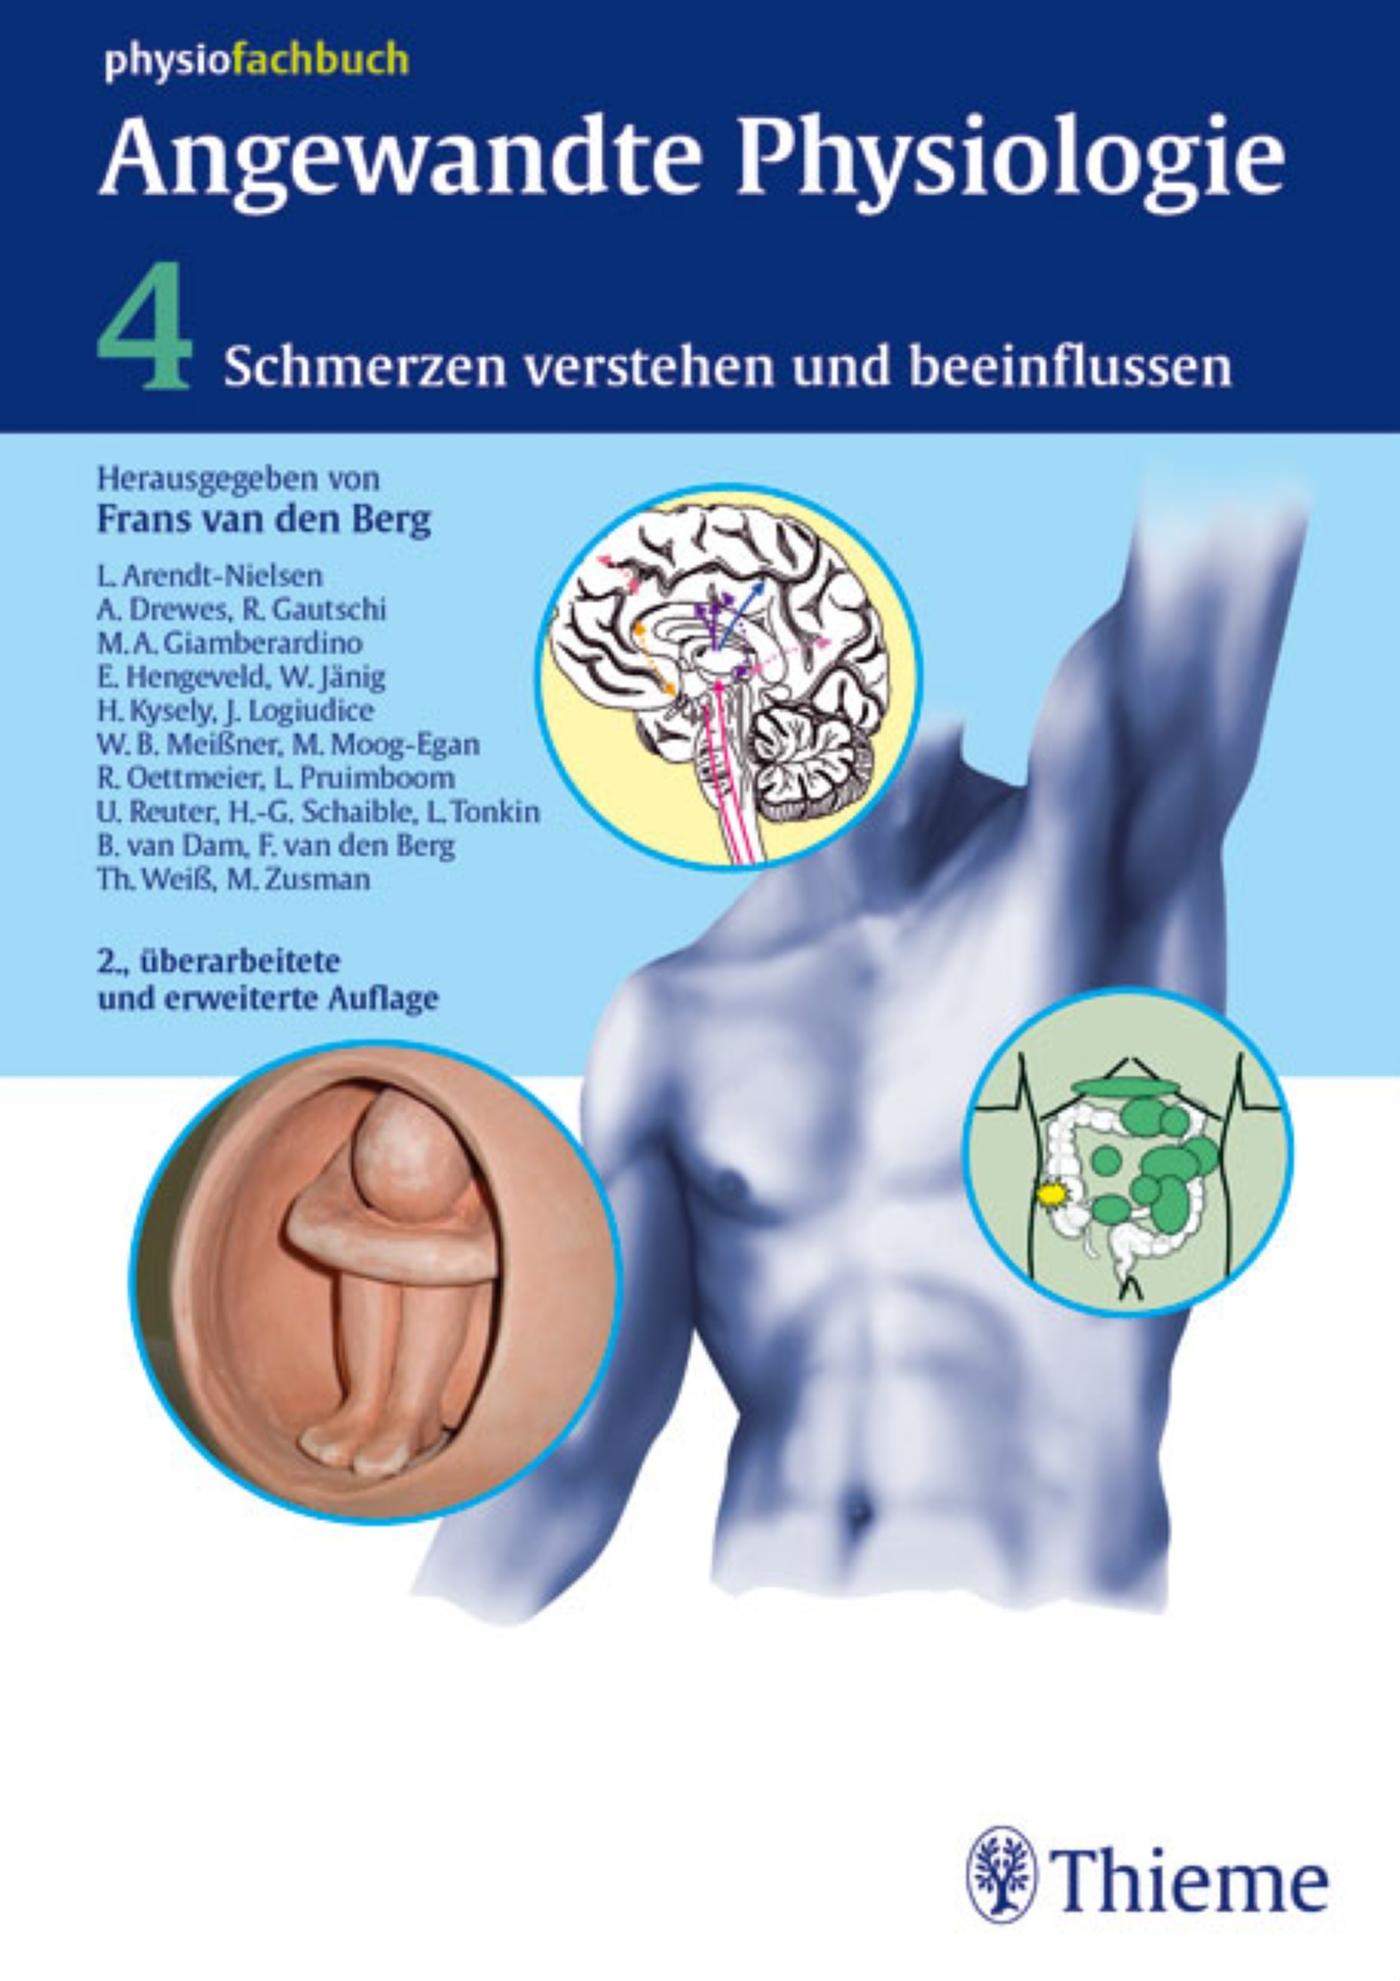 Angewandte Physiologie